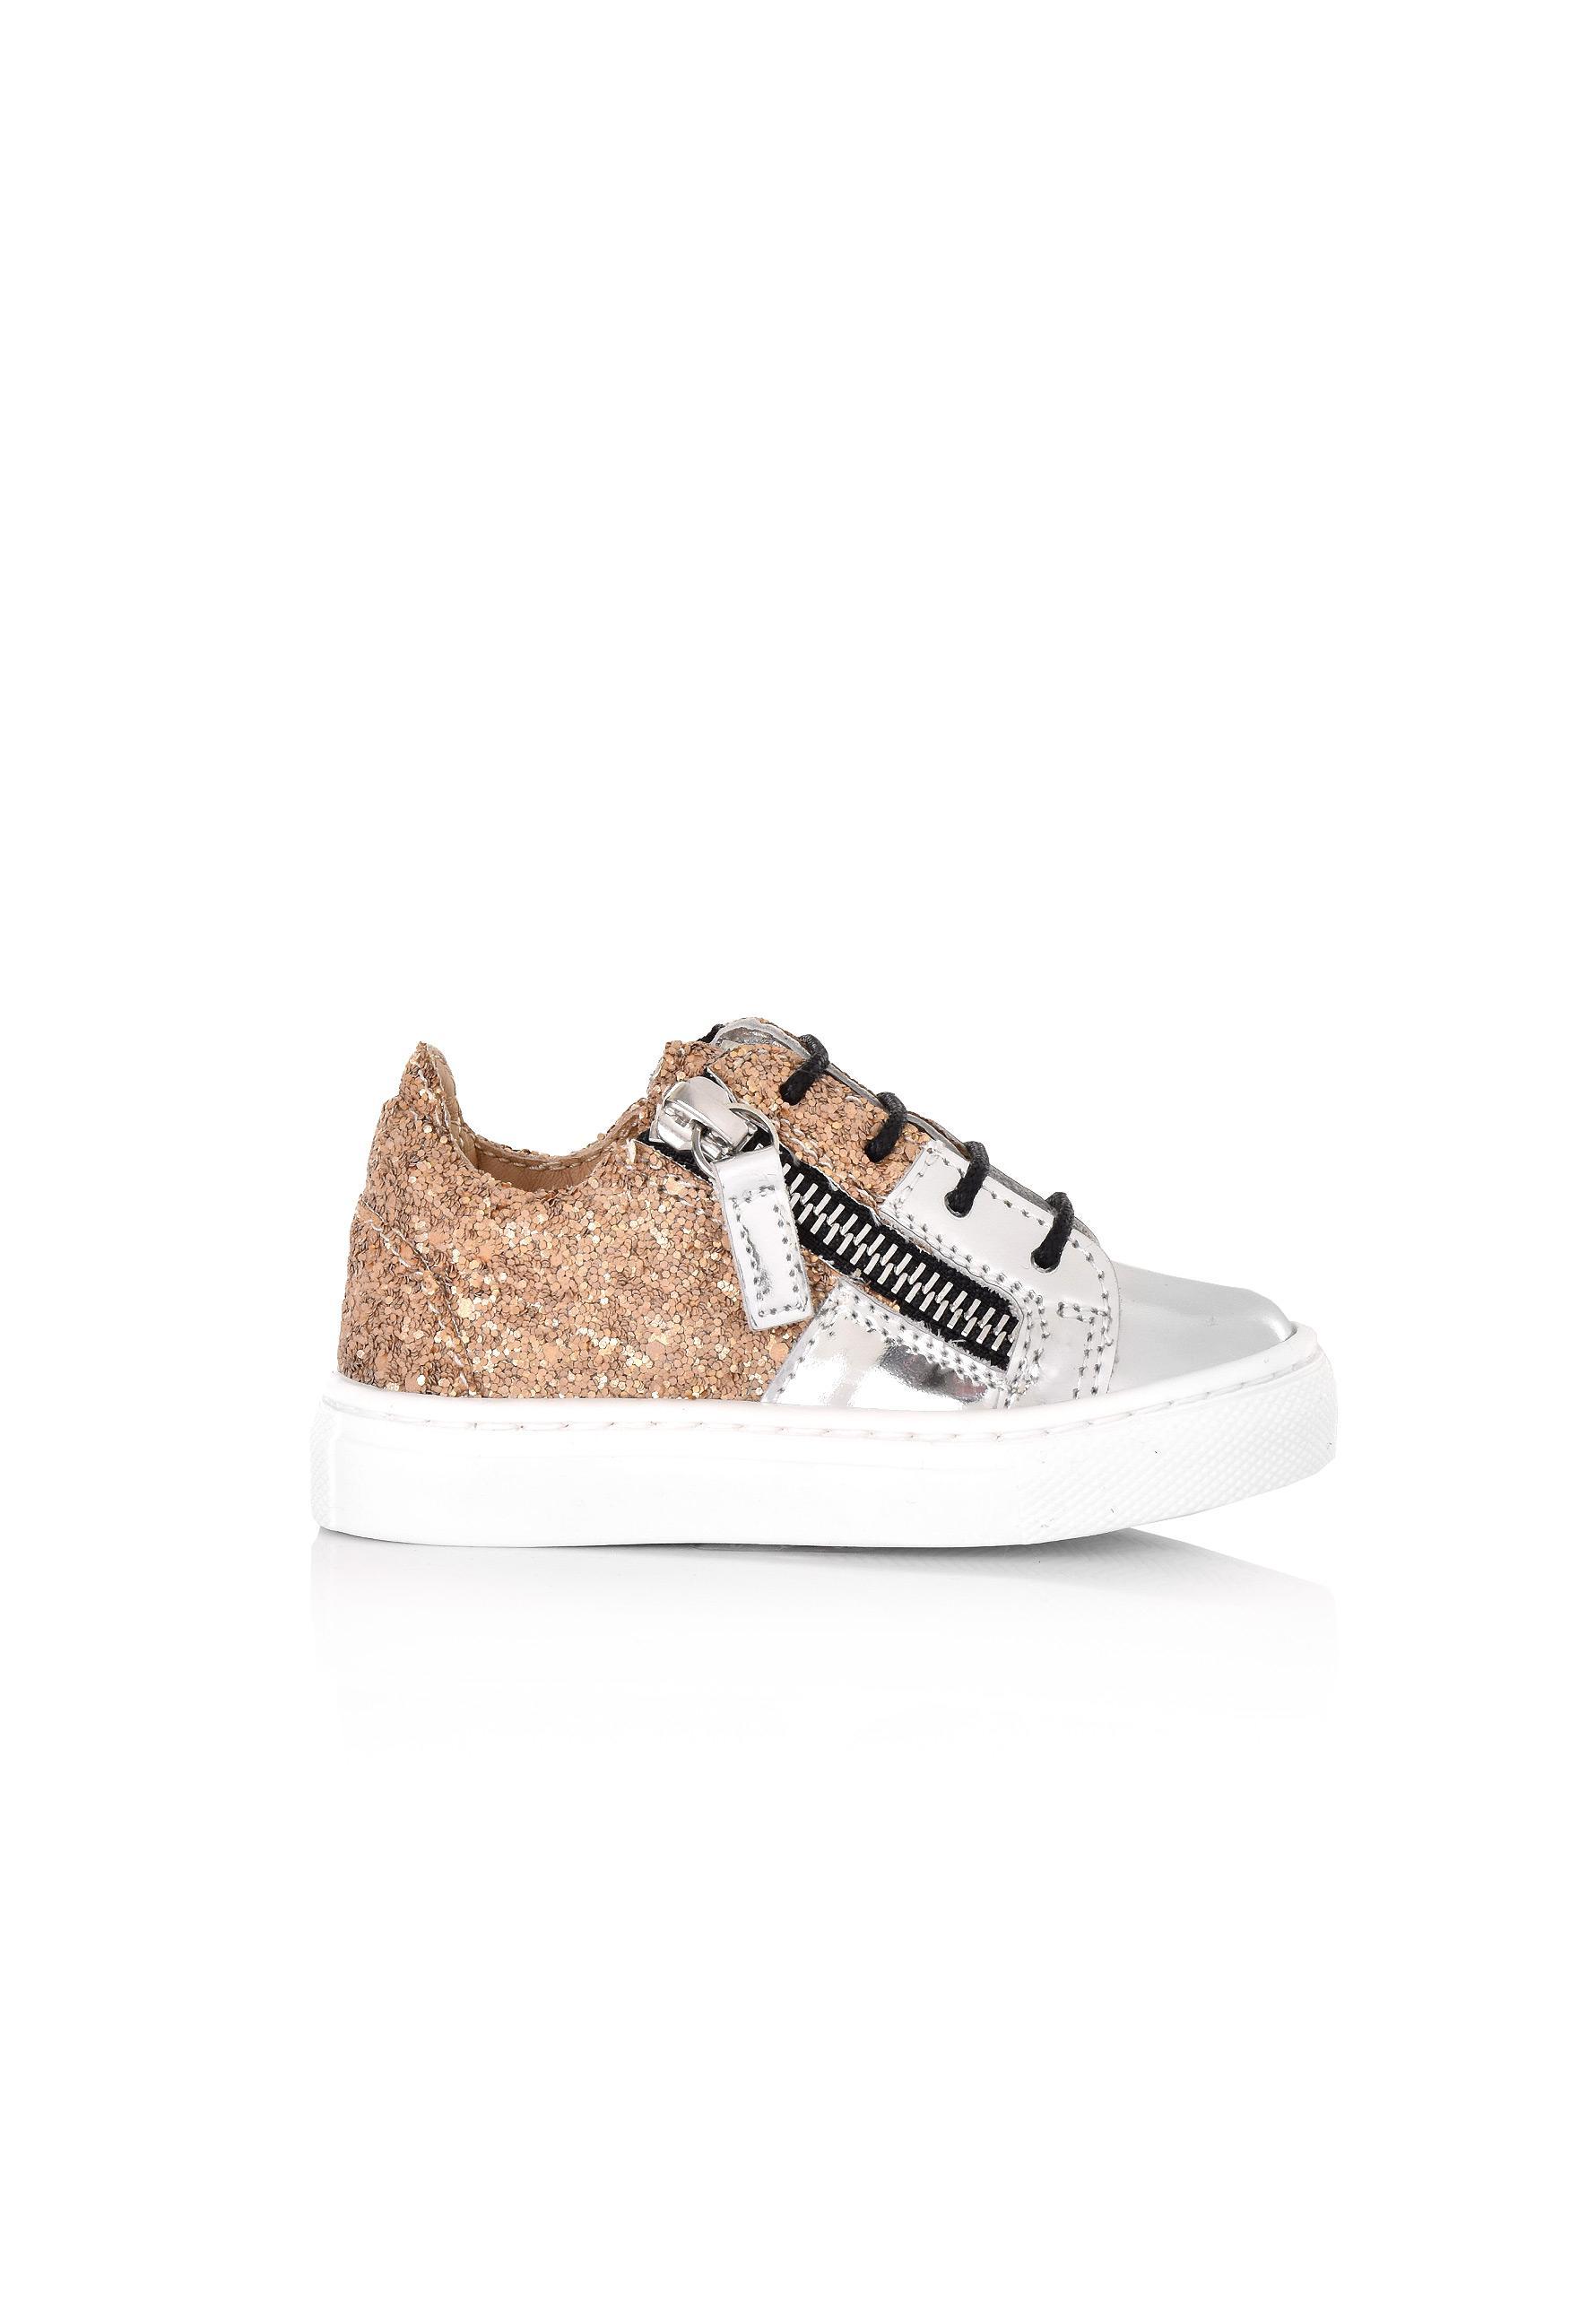 78fb8da0f38e Lyst - Giuseppe Zanotti Kids Cheryl Glitter Jr. Sneakers Metallic ...